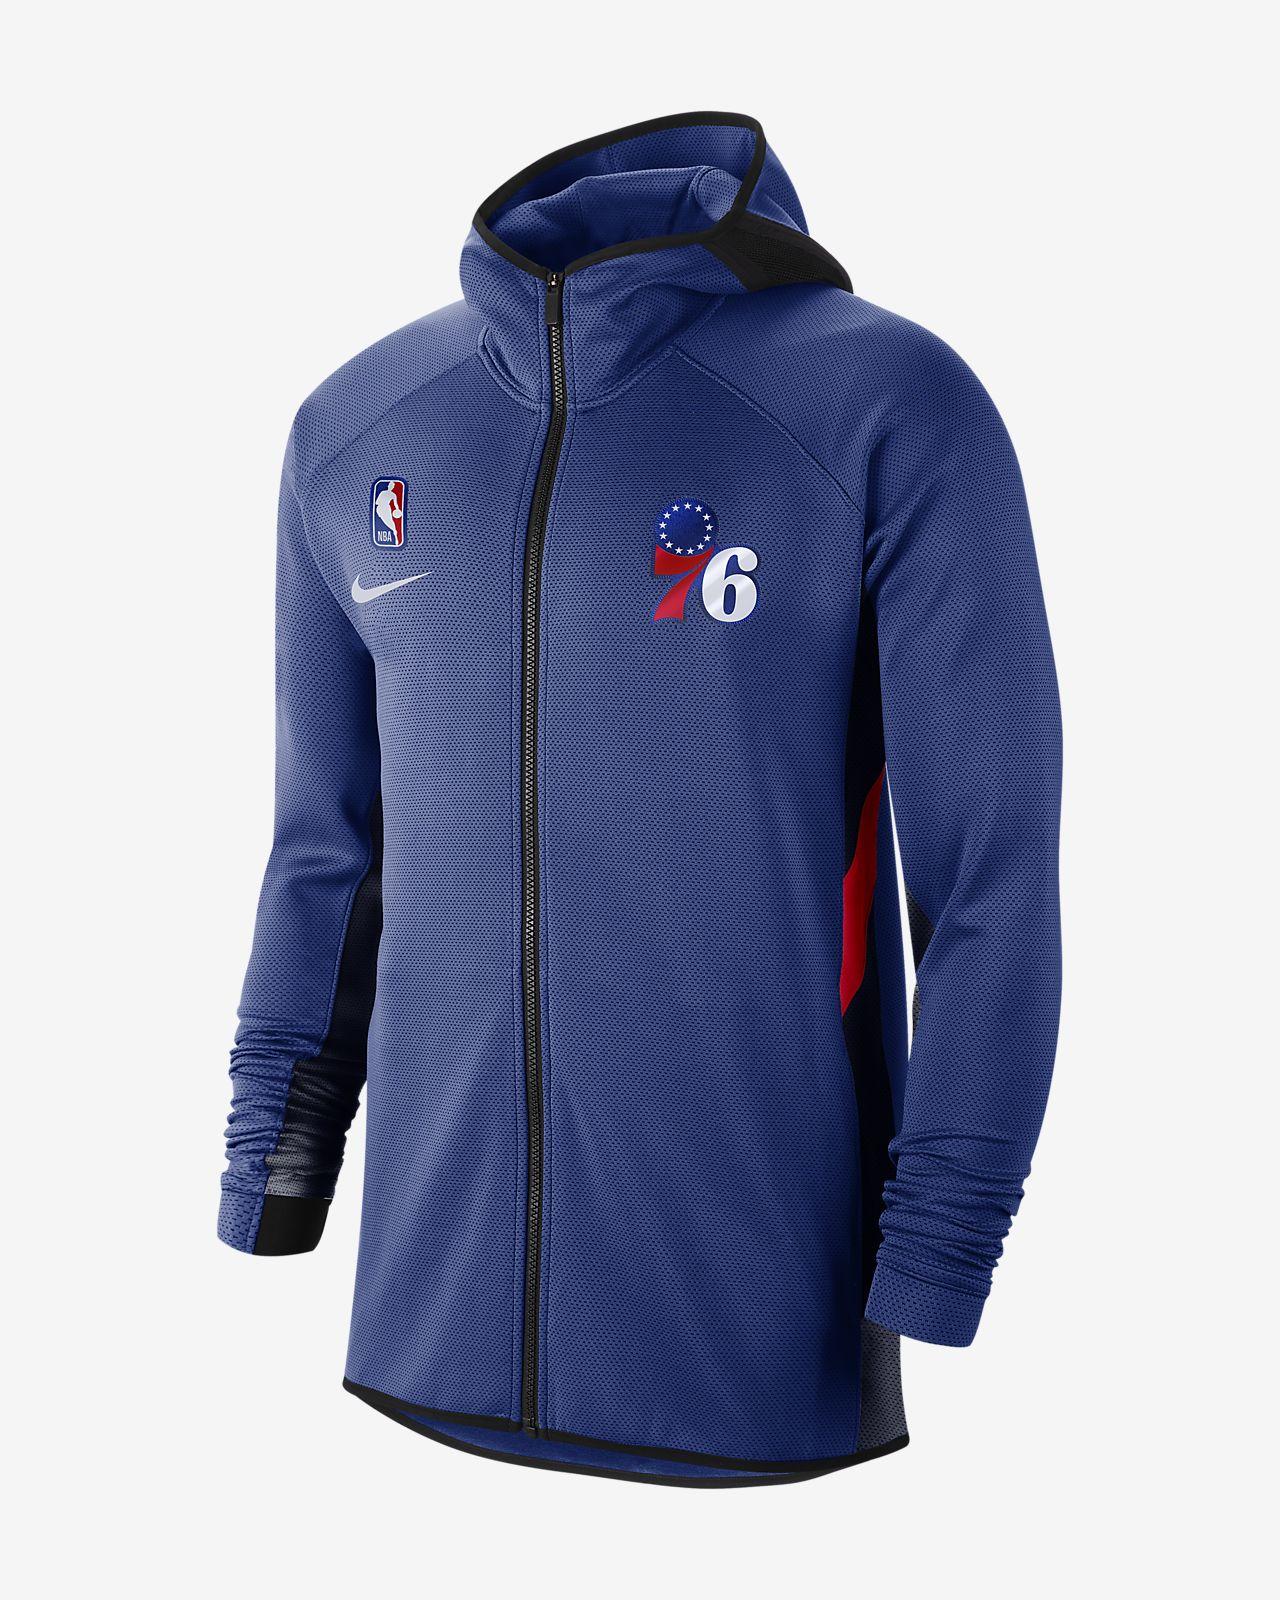 Philadelphia 76ers Nike Hoodies, Nike Hooded Sweatshirt